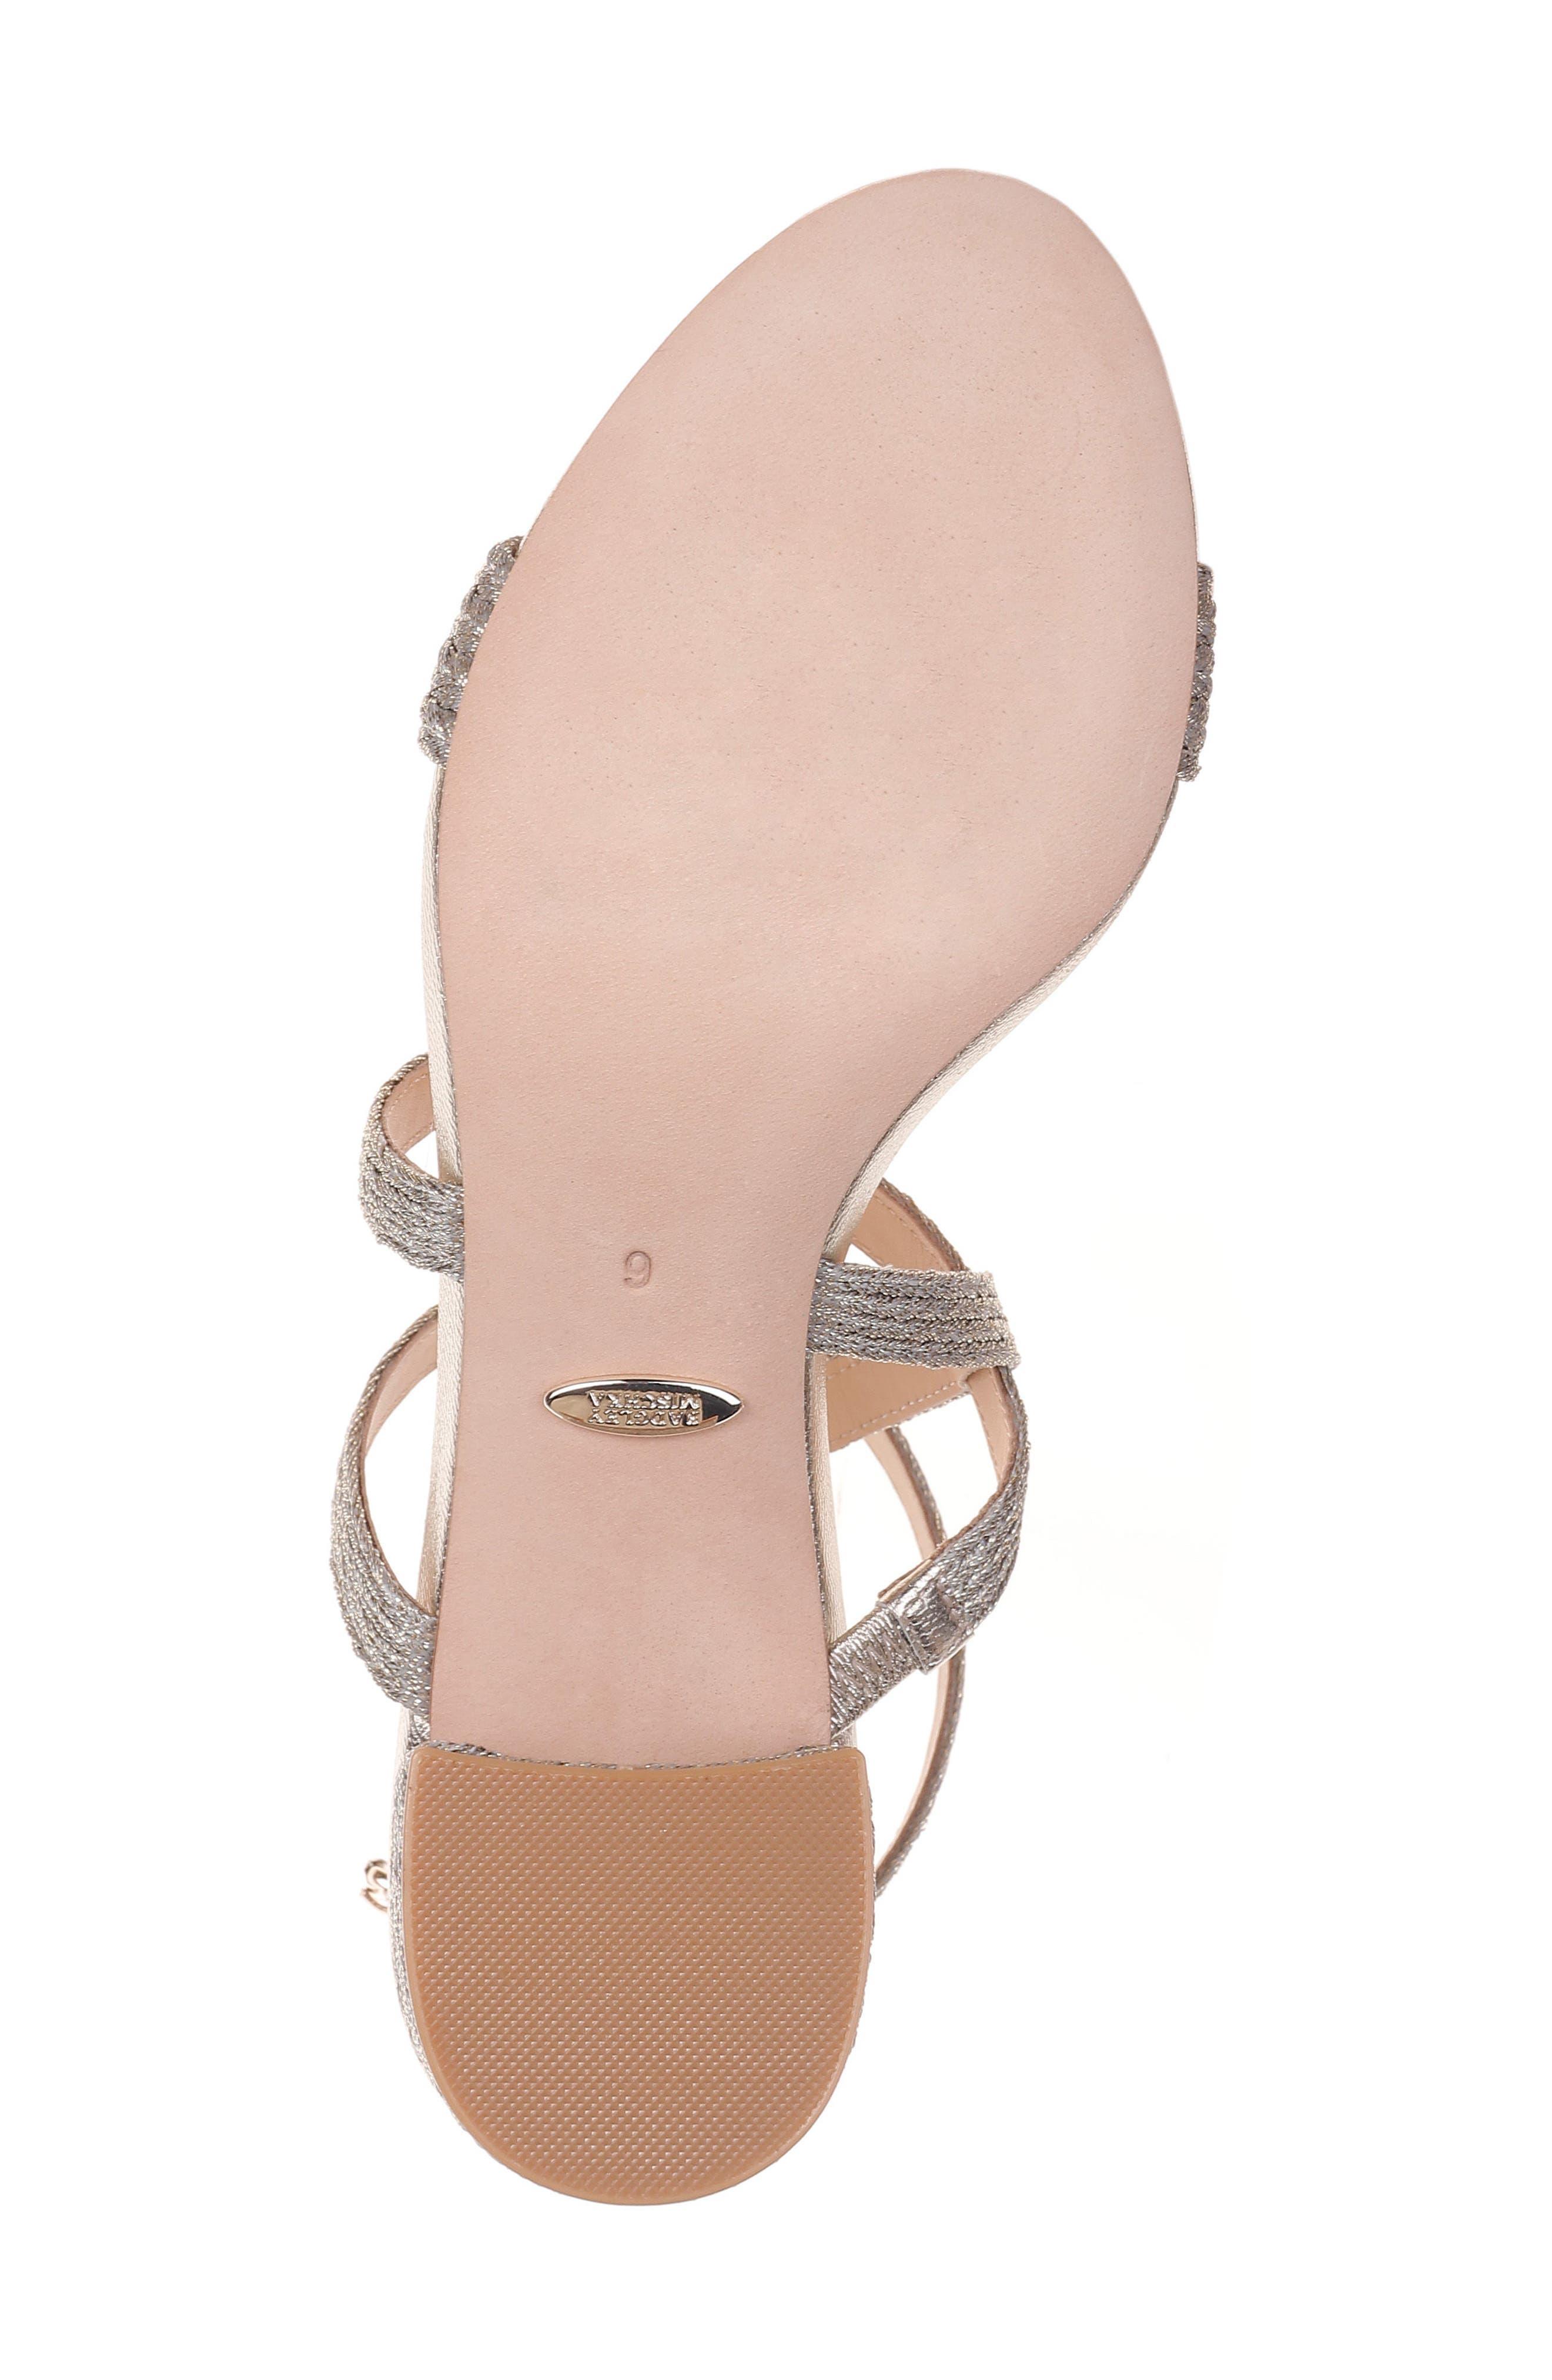 Storm Block Heel Sandal,                             Alternate thumbnail 6, color,                             PLATINO FABRIC